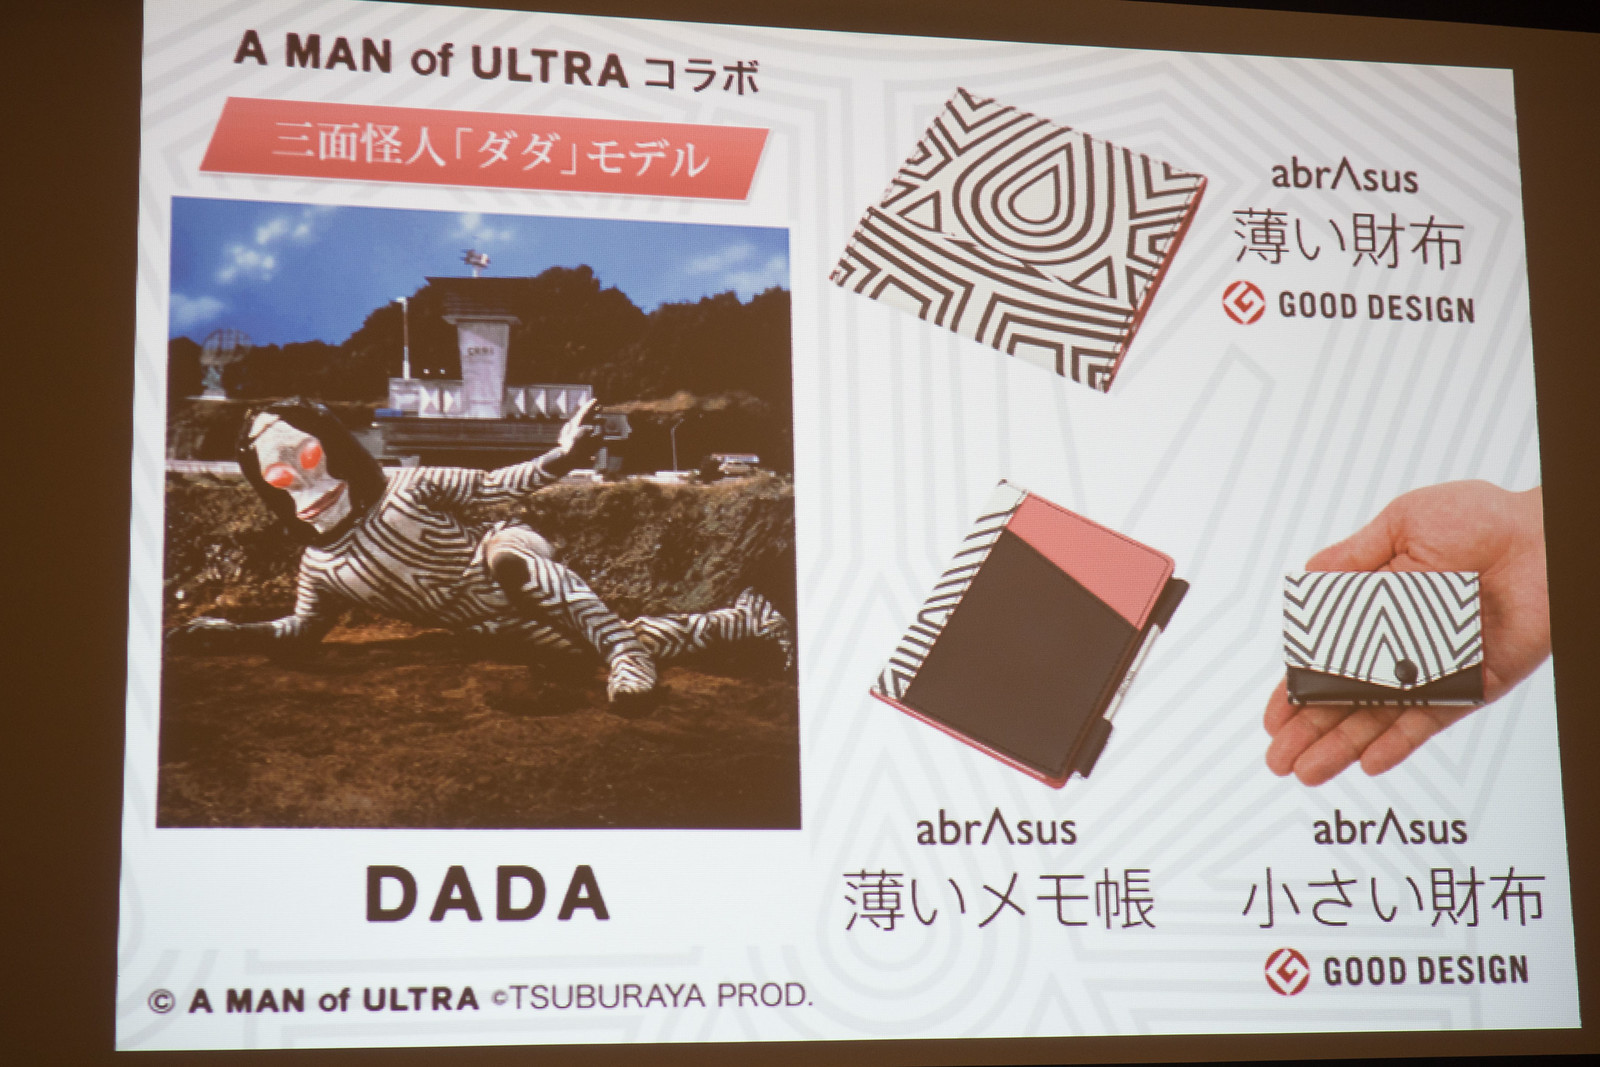 A_MAN_of_ULTRA-14